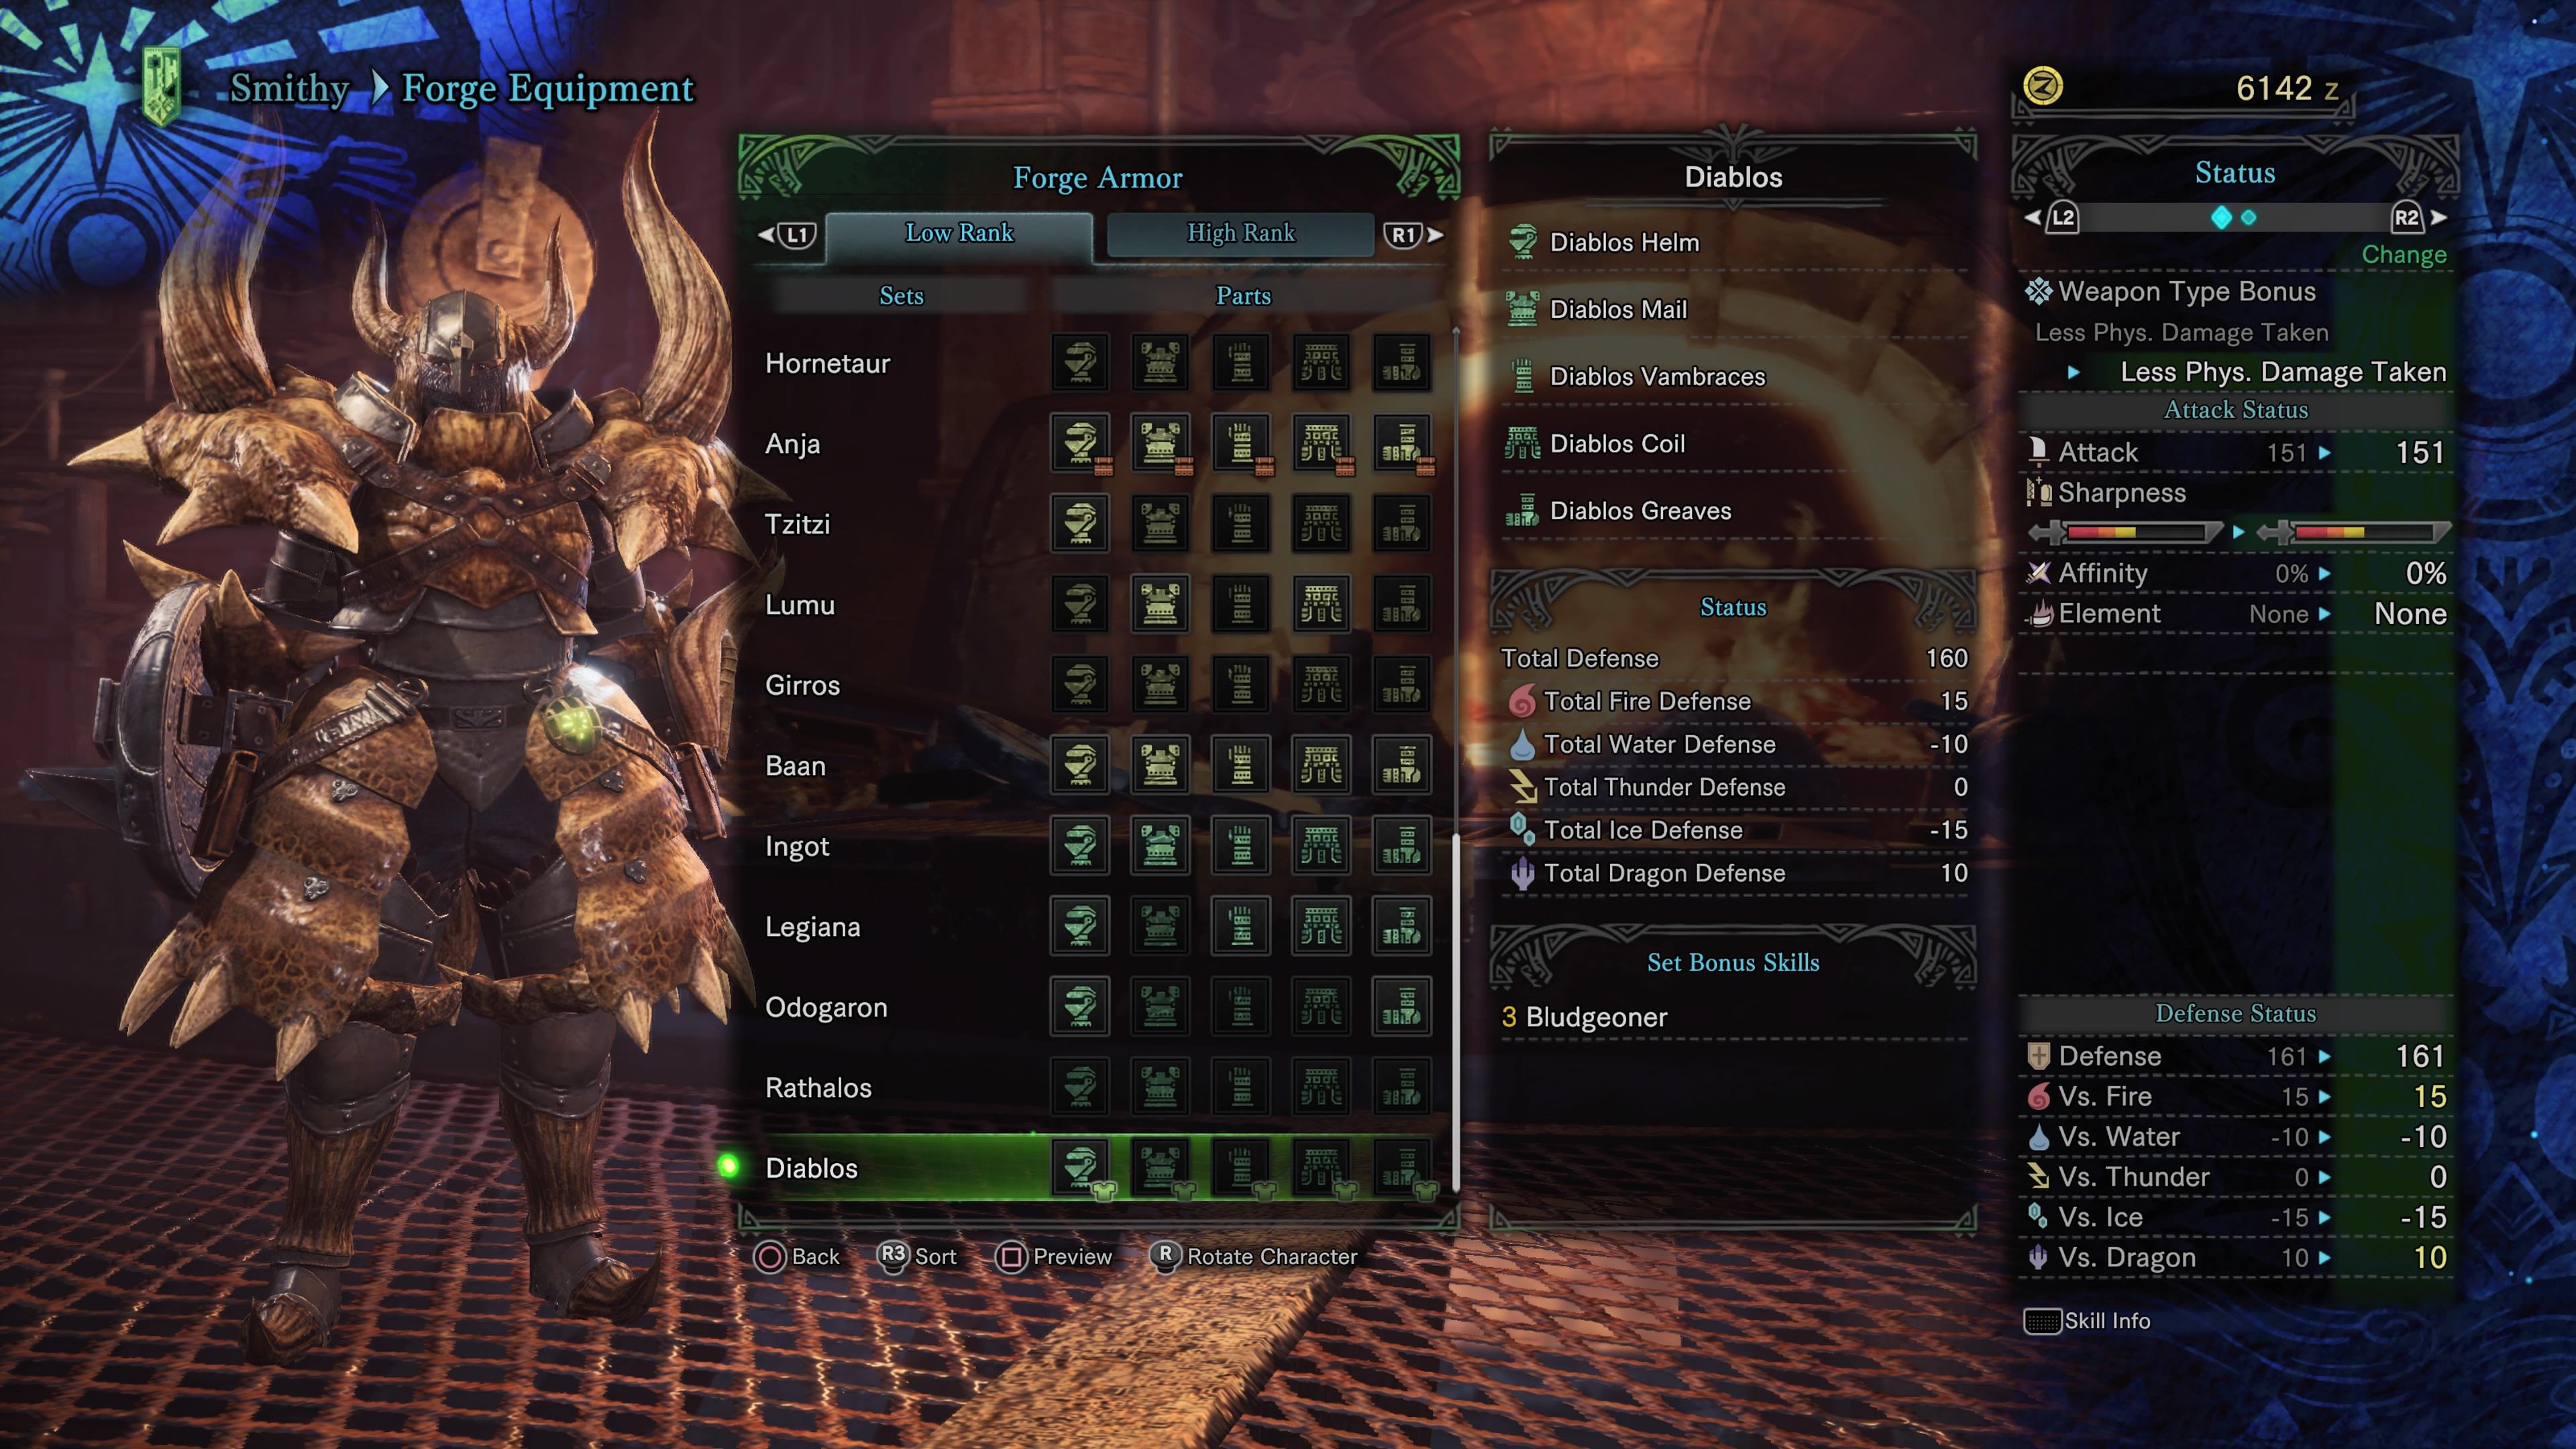 Monster Hunter: World Armor Sets - All Low Rank Armor Sets